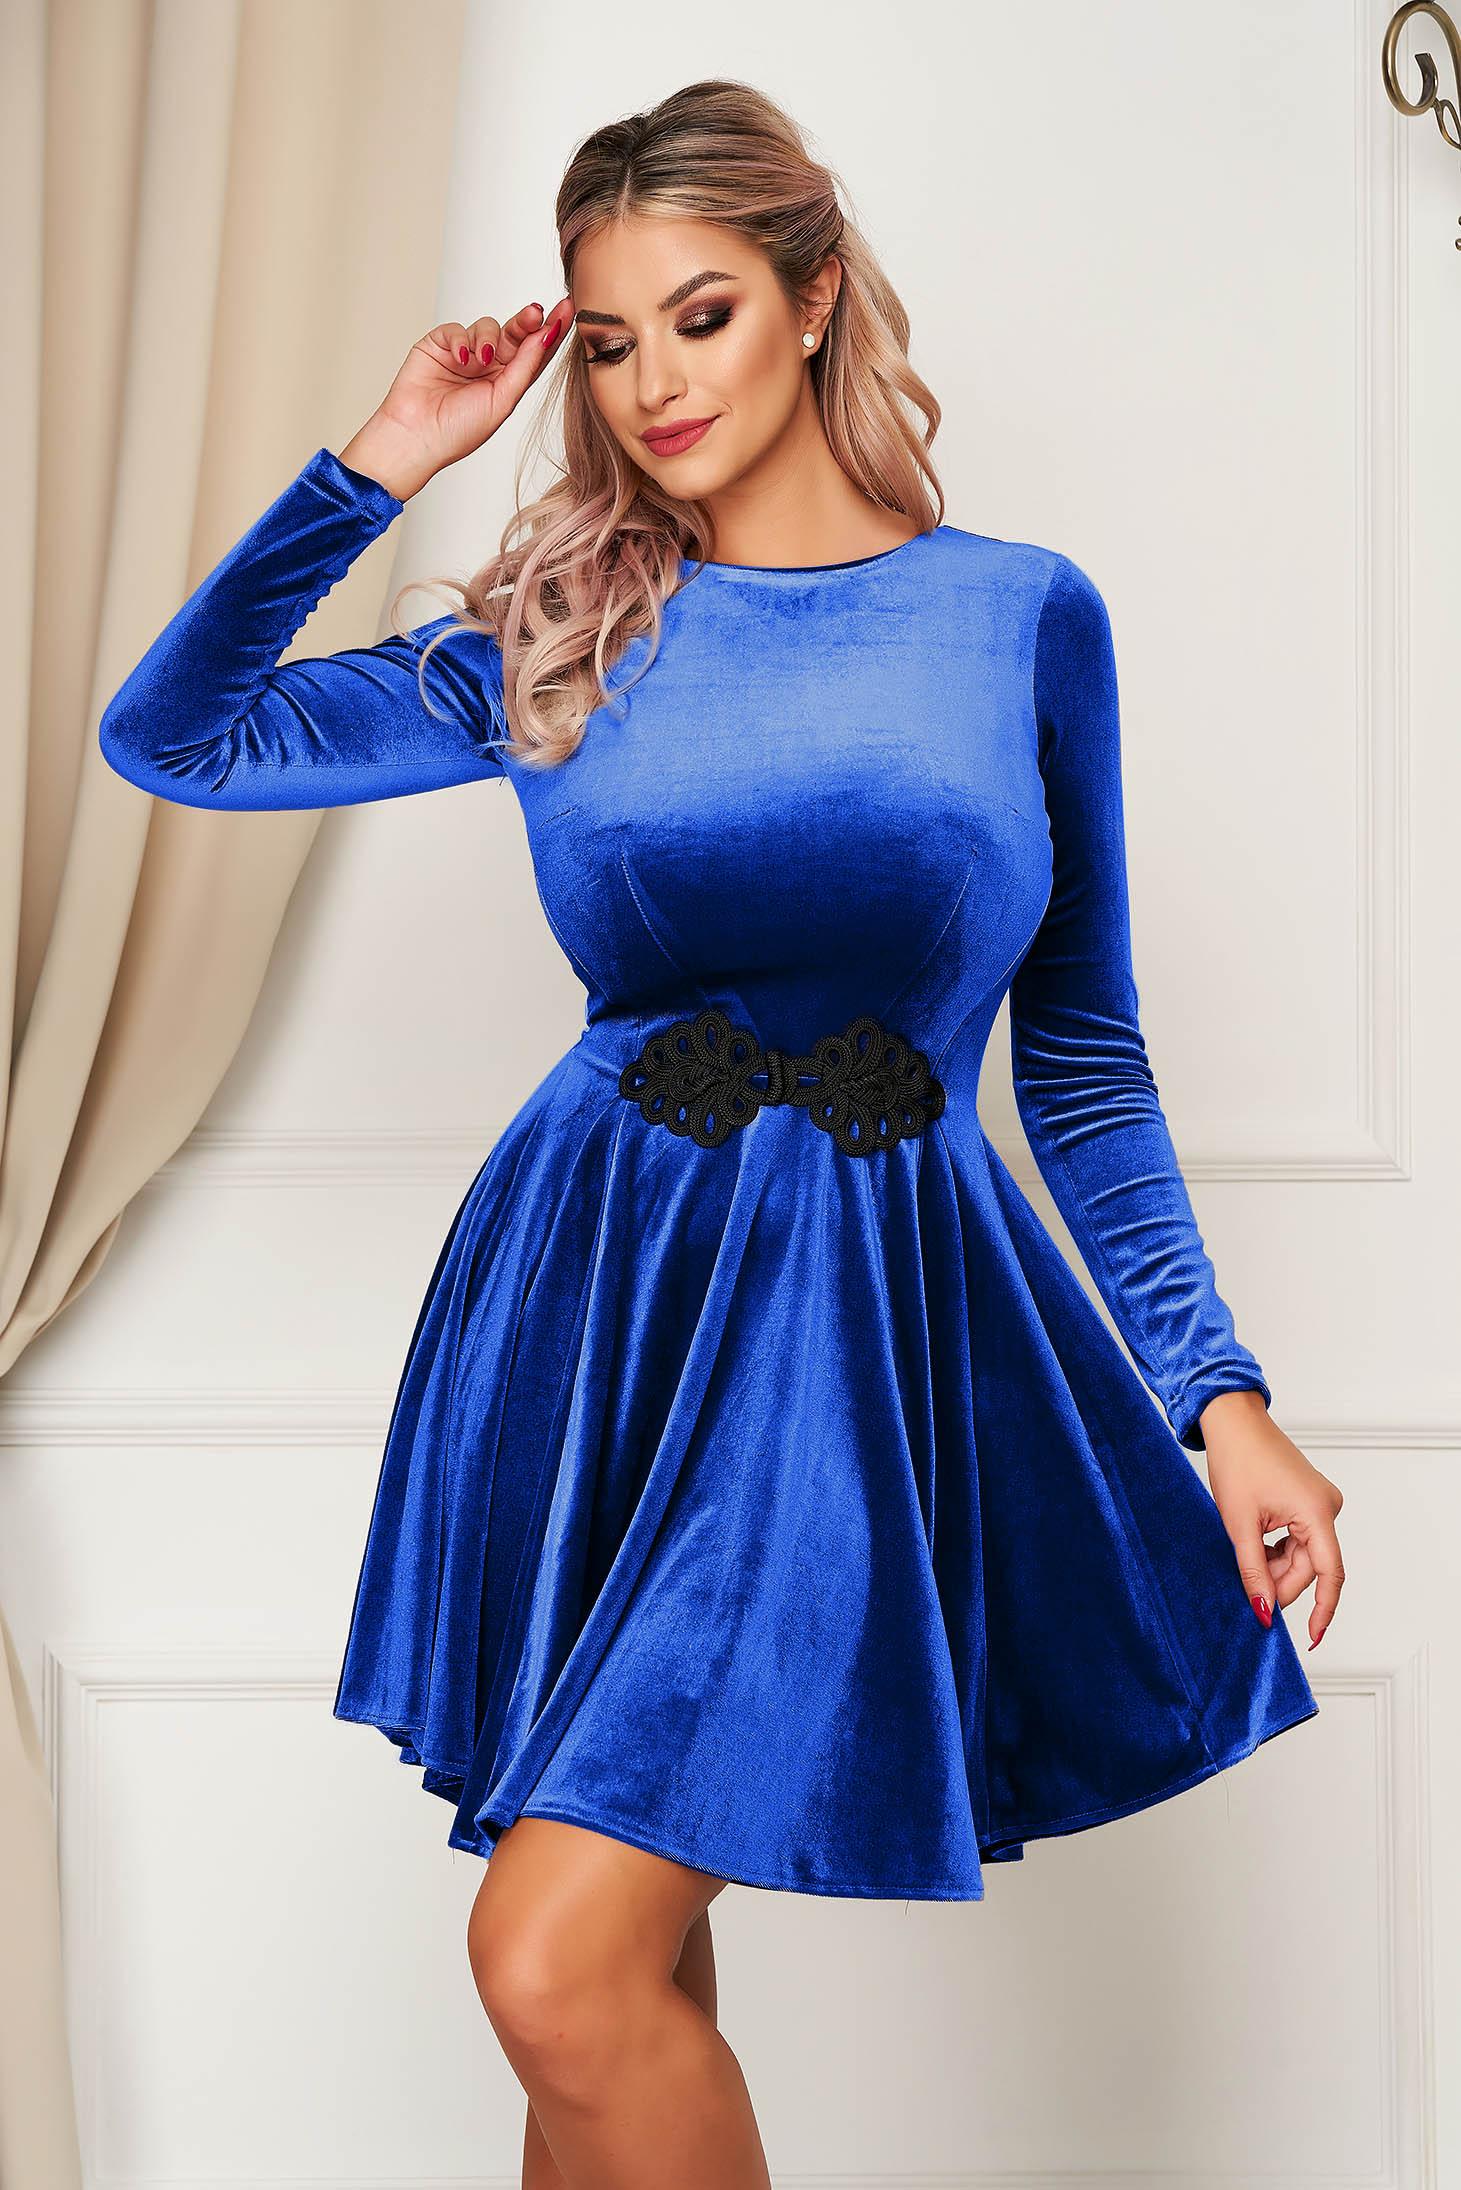 Rochie albastru de ocazie in clos din catifea cu insertii de broderie